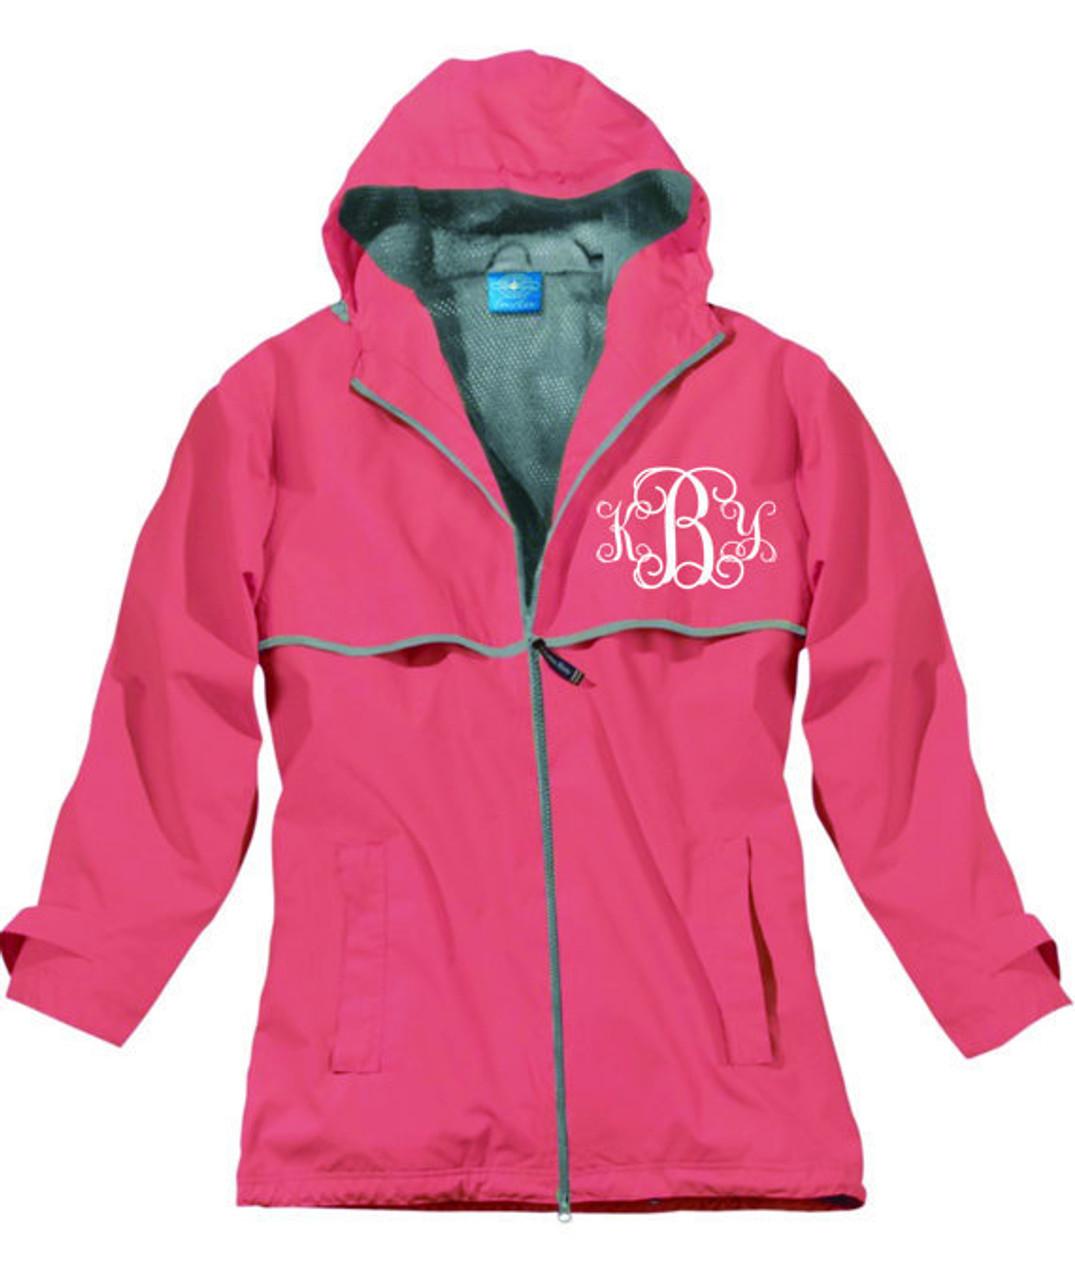 43f020f23 Monogrammed Rain Jacket